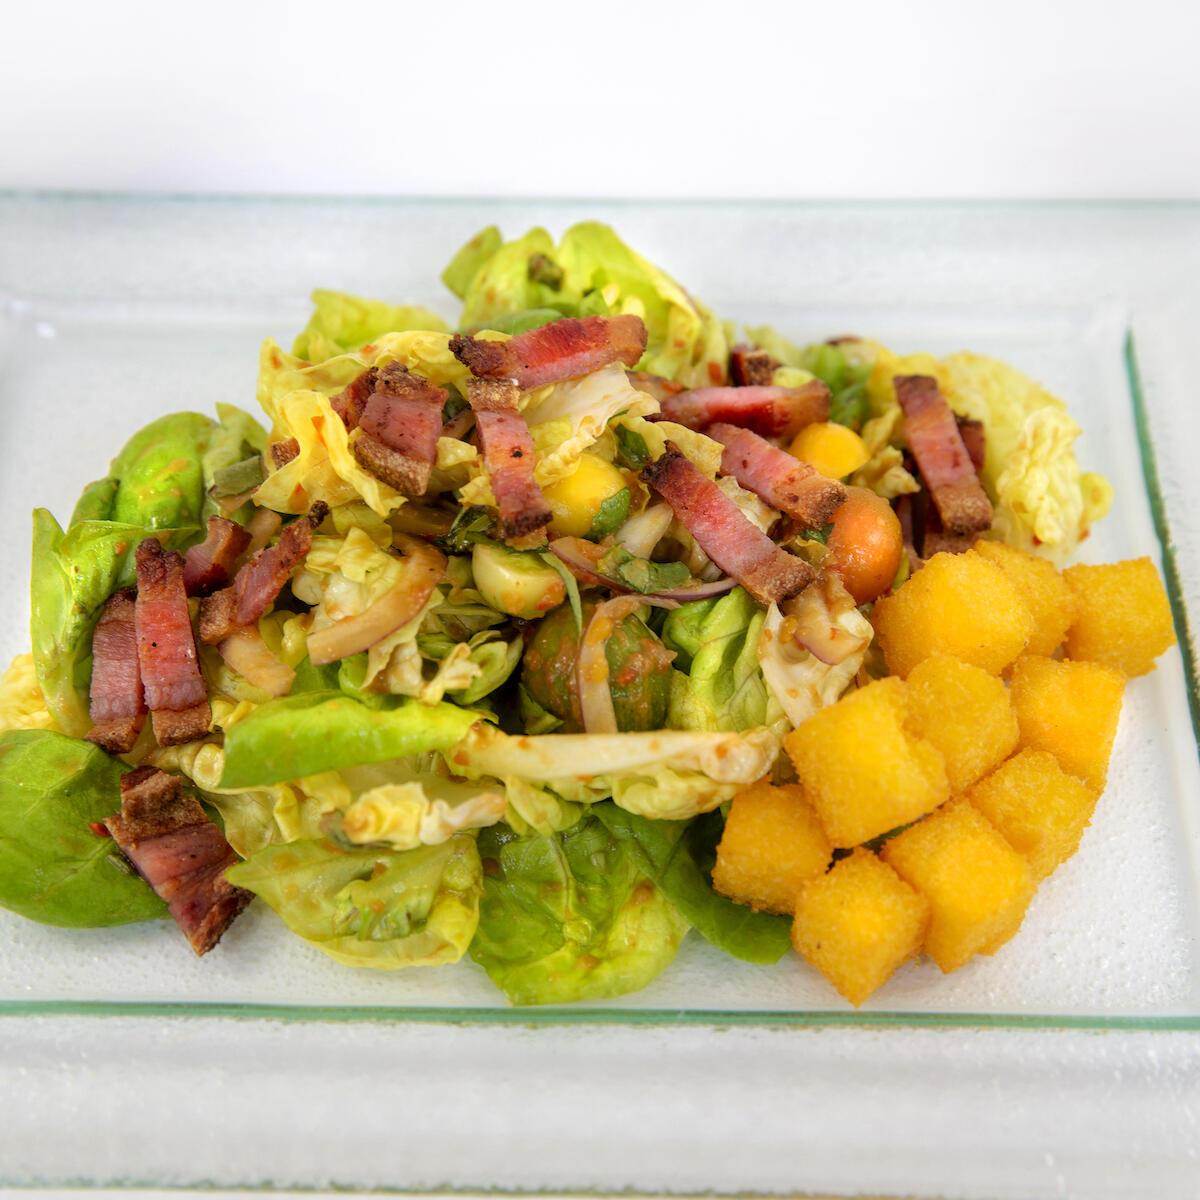 Cena Salad